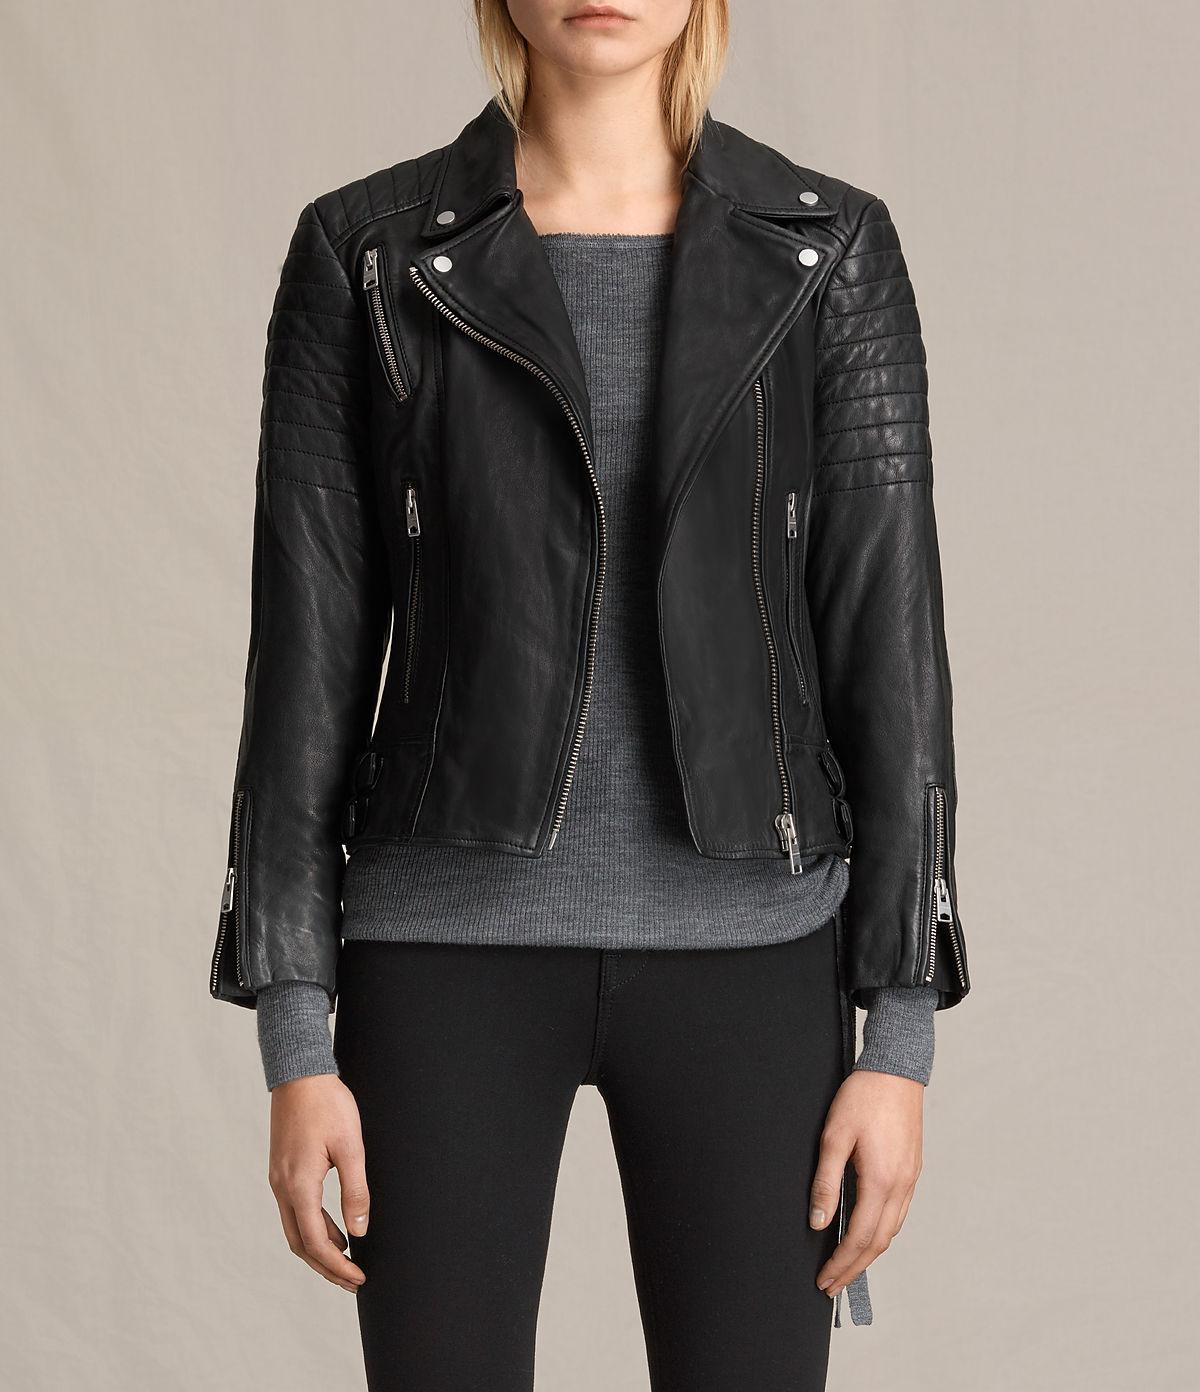 papin-leather-biker-jacket